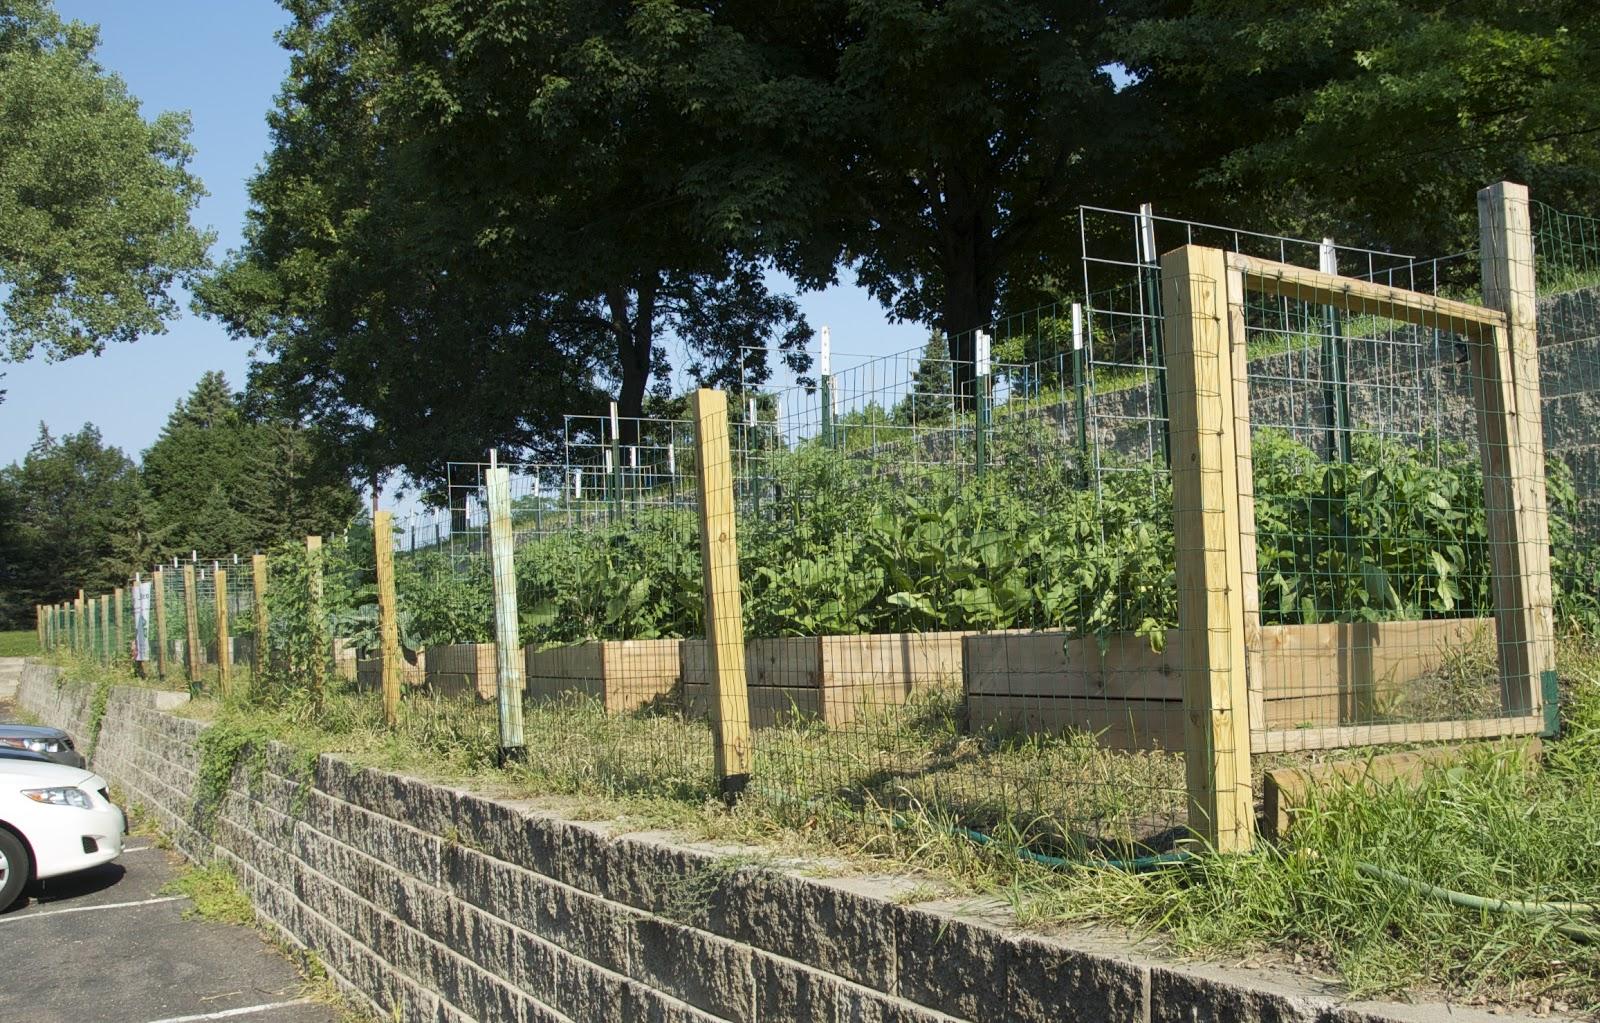 Savoring Servant State Funding For Community Gardening